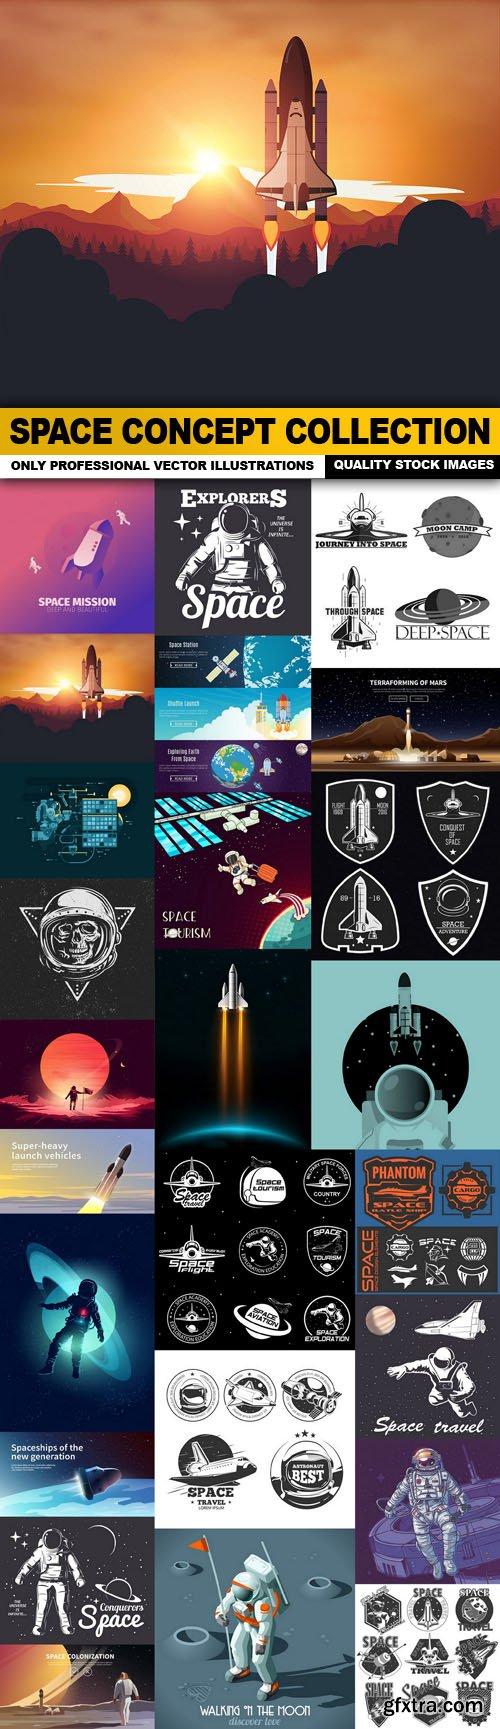 Space Concept Collection - 25 Vector